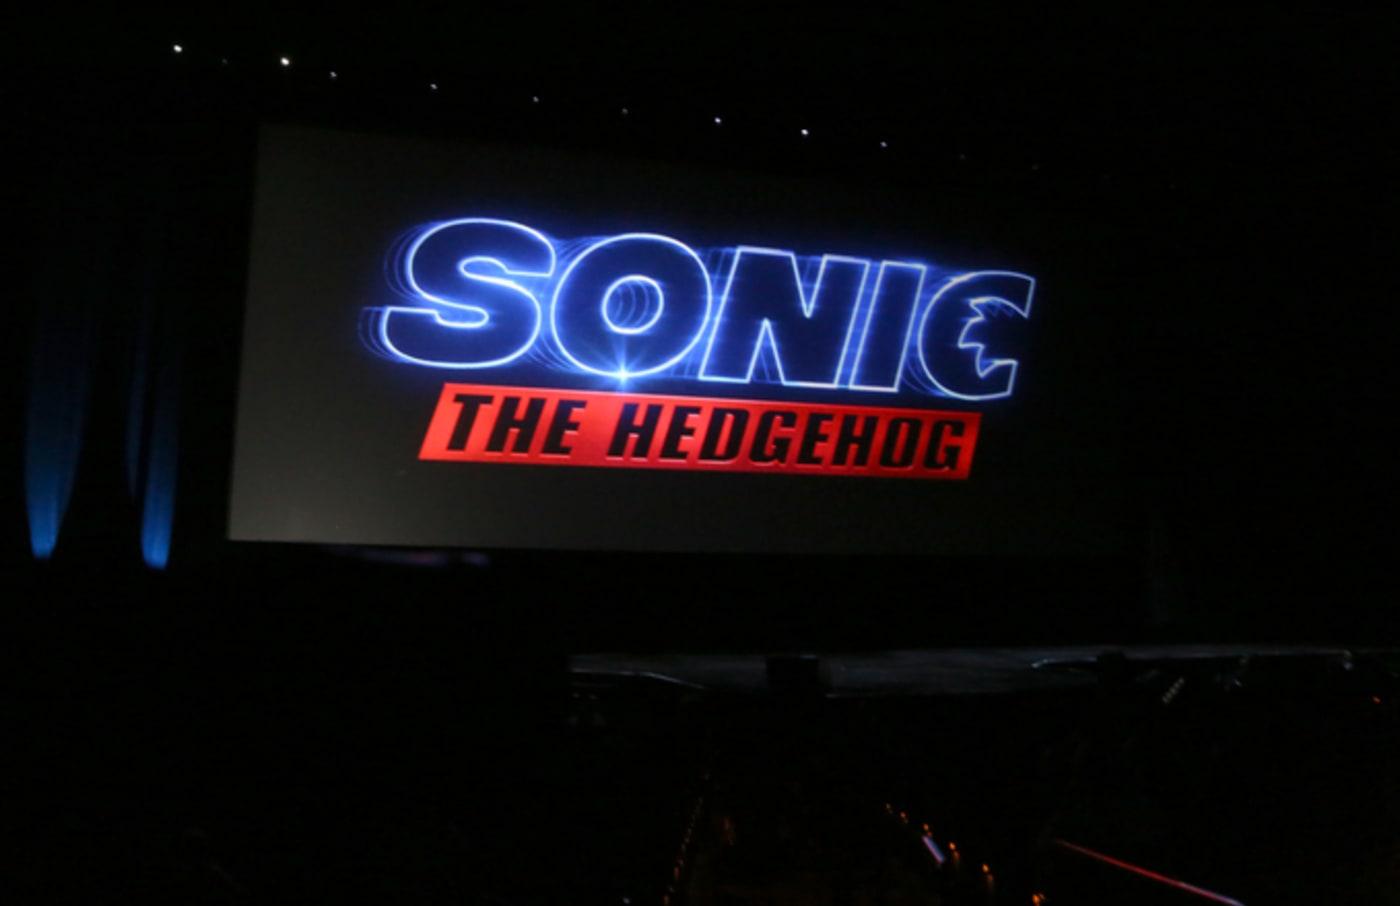 sonic the hedgehog movie screen